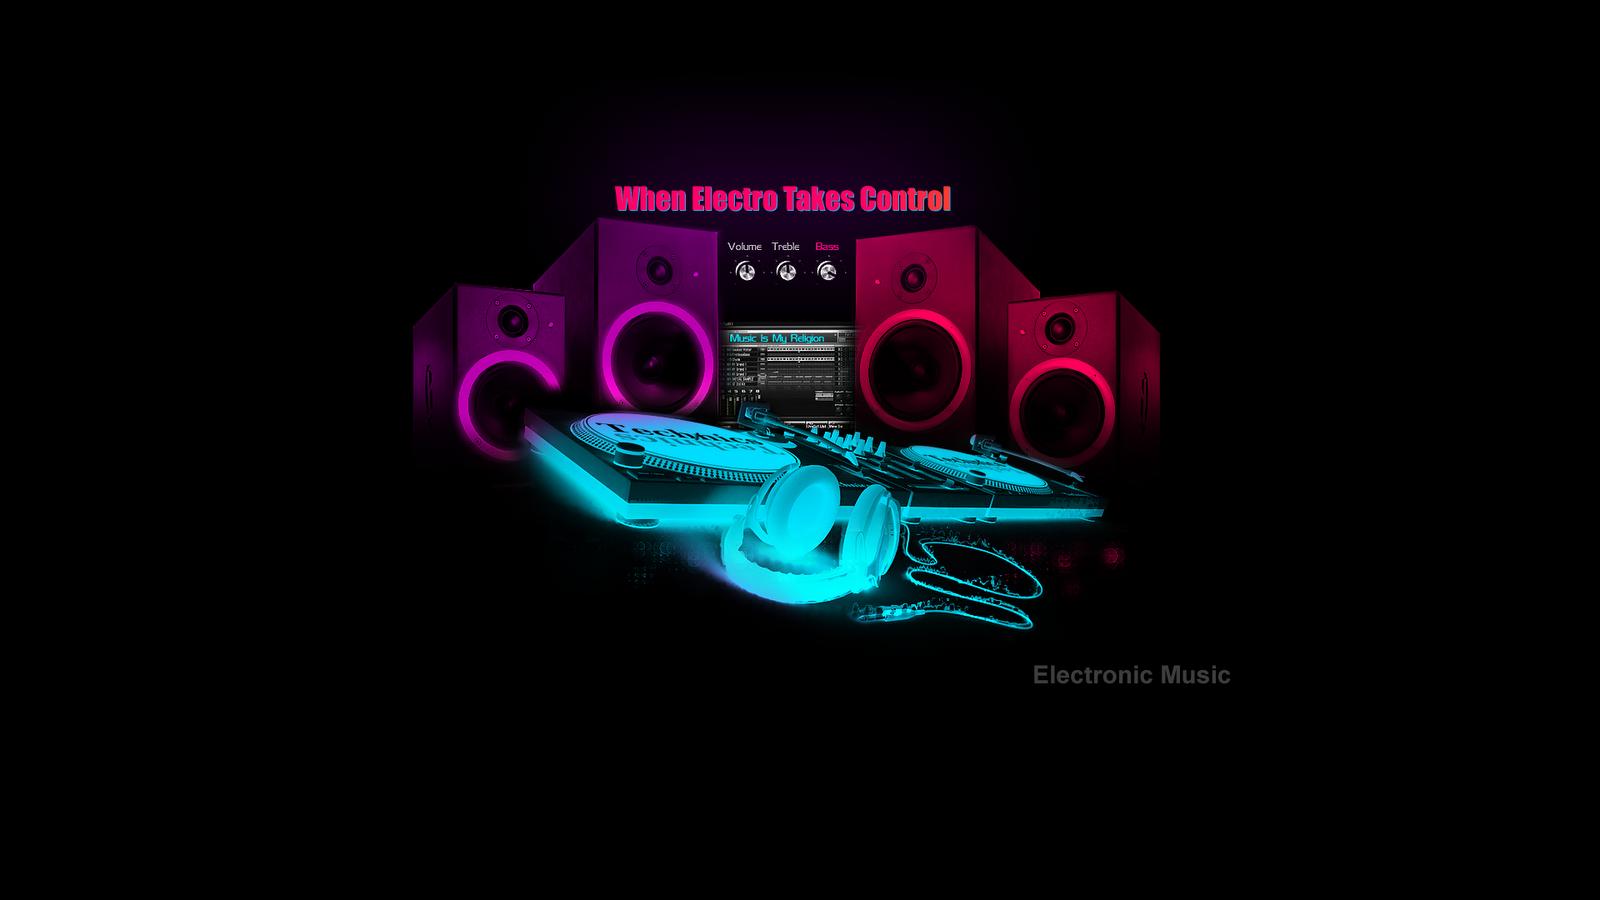 http://3.bp.blogspot.com/-gx6F_4hRf5U/TlytR_1RmYI/AAAAAAAABws/QwiEHer85vs/s1600/Techno_Electro_House_Trance_+wallpaper.png